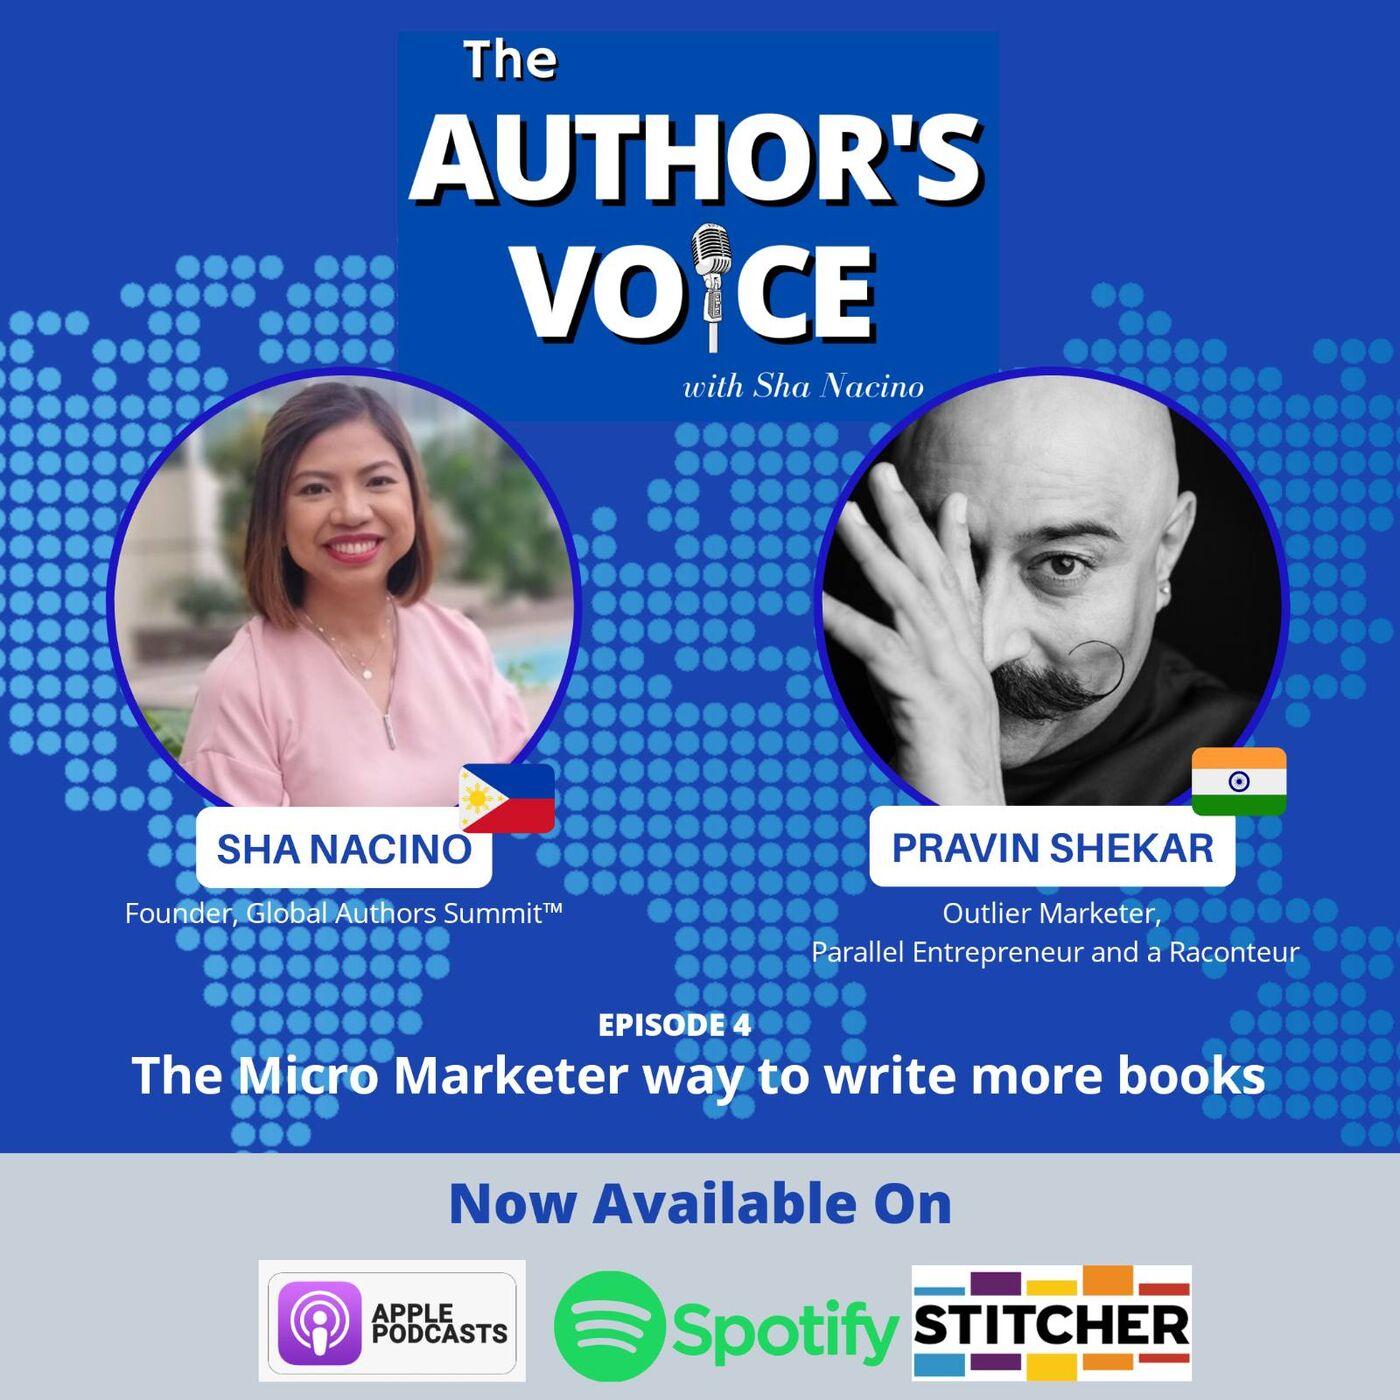 TAV 004: The Micro Marketer Way to Write More Books with Pravin Shekar